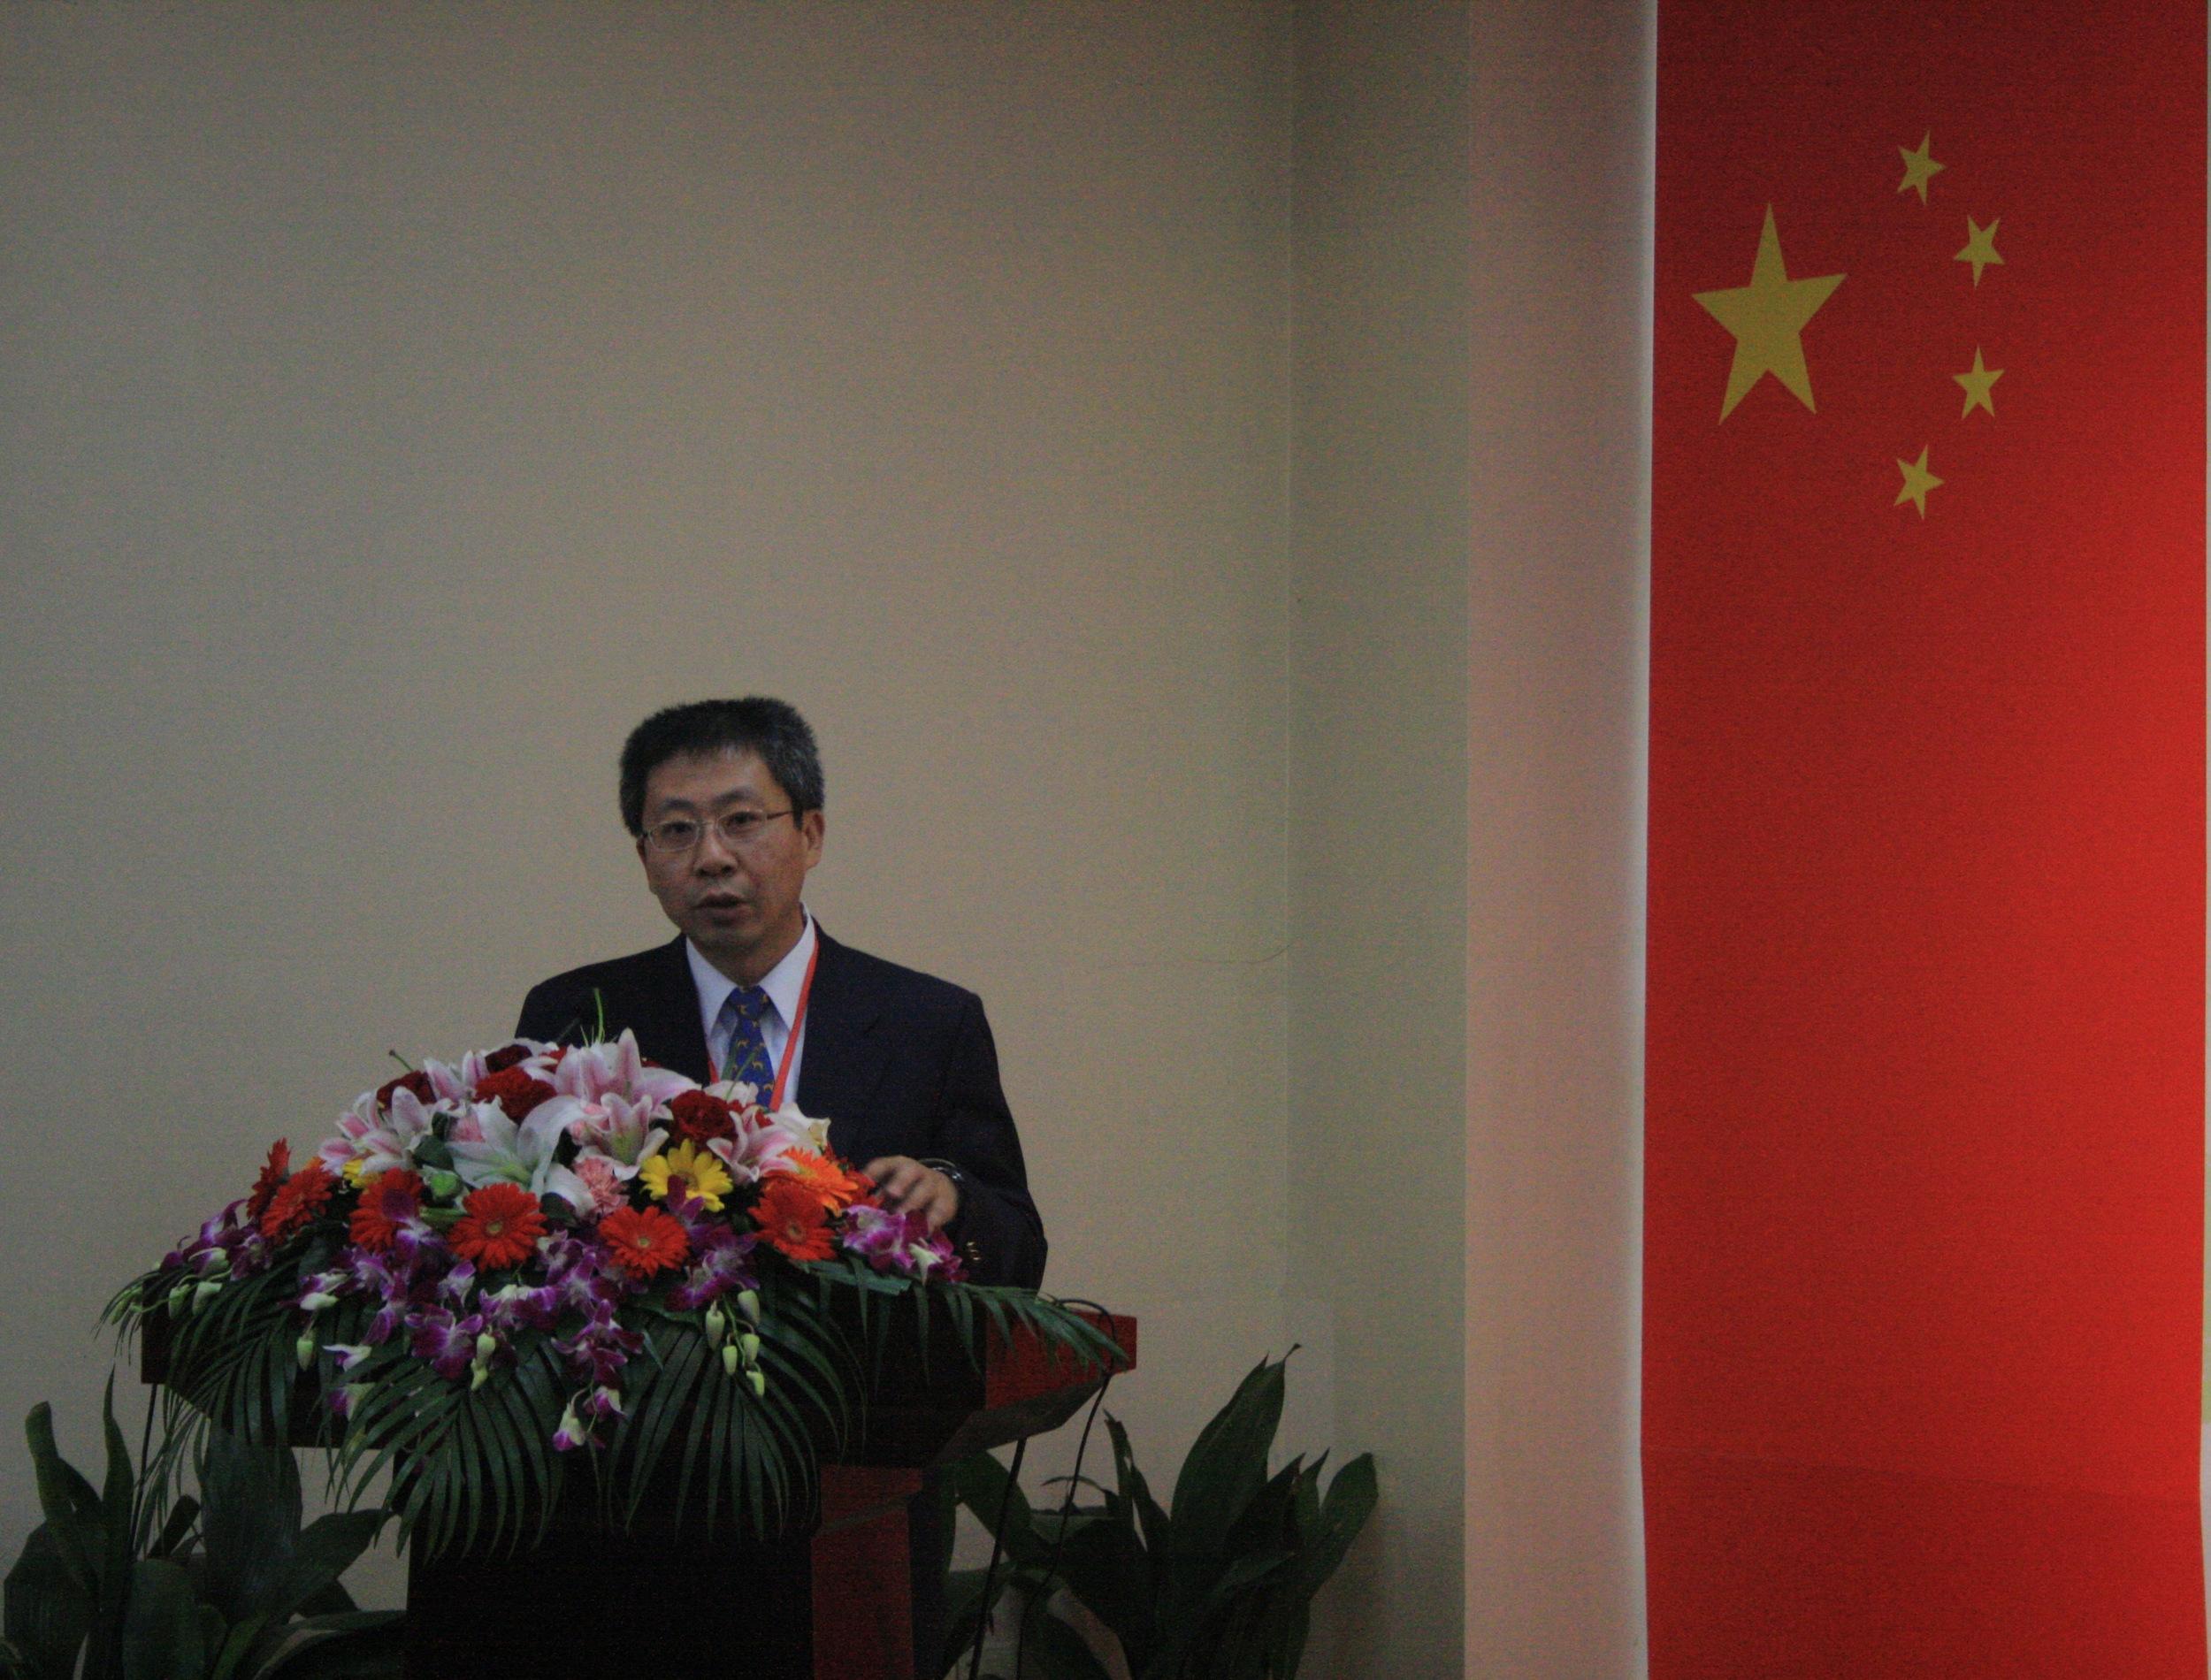 Prof. Yang YE, Deputy Director of SIMM, is giving the opening speech.